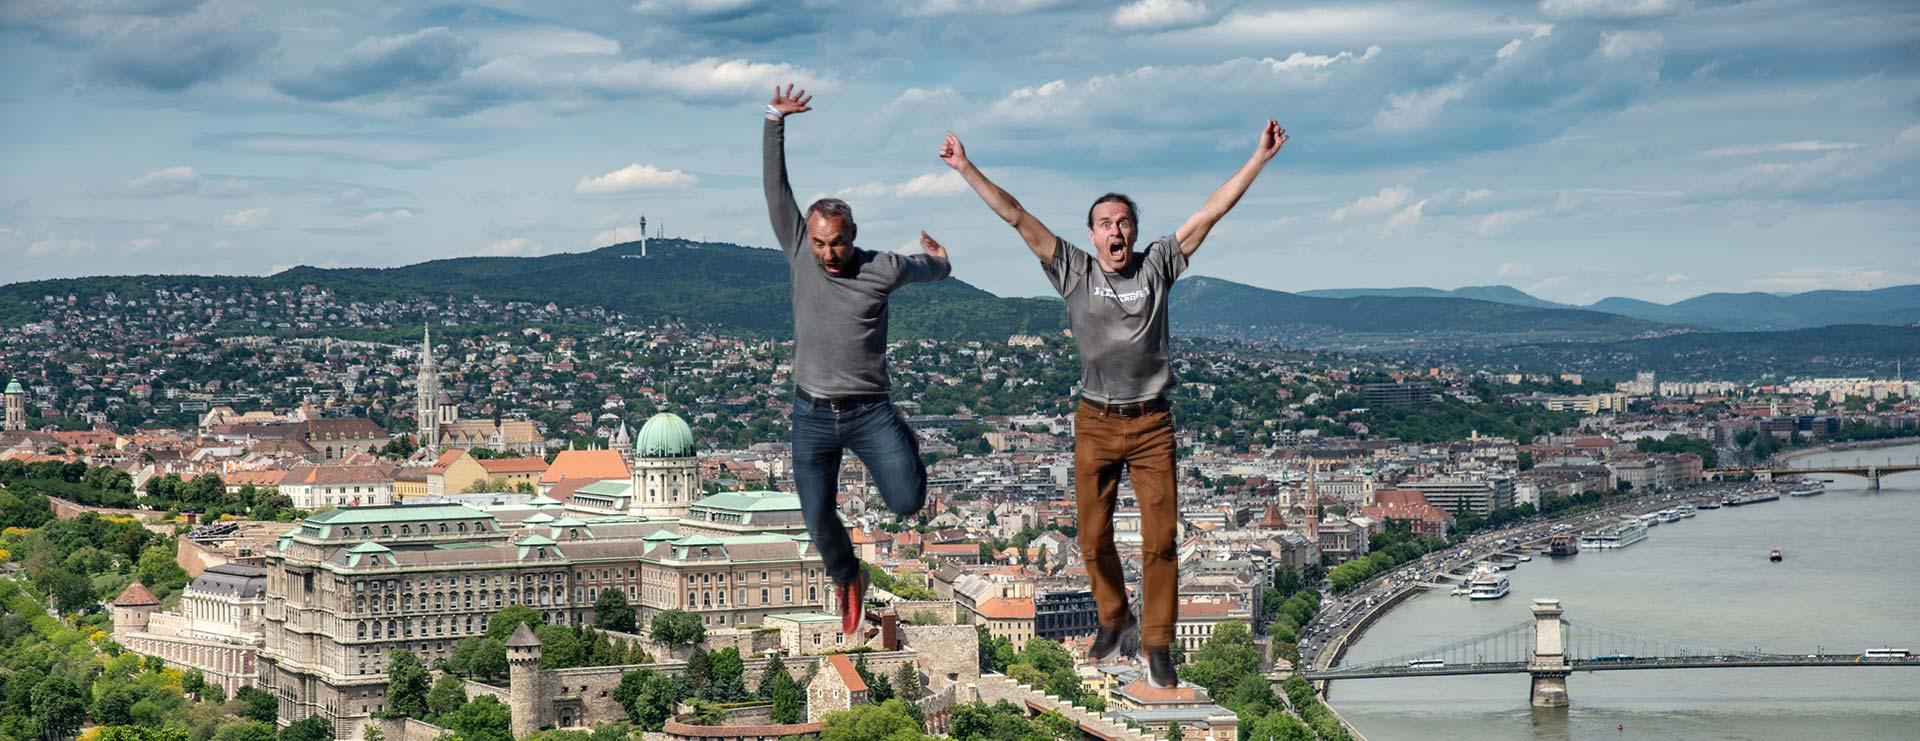 mediaPool goes Budapest